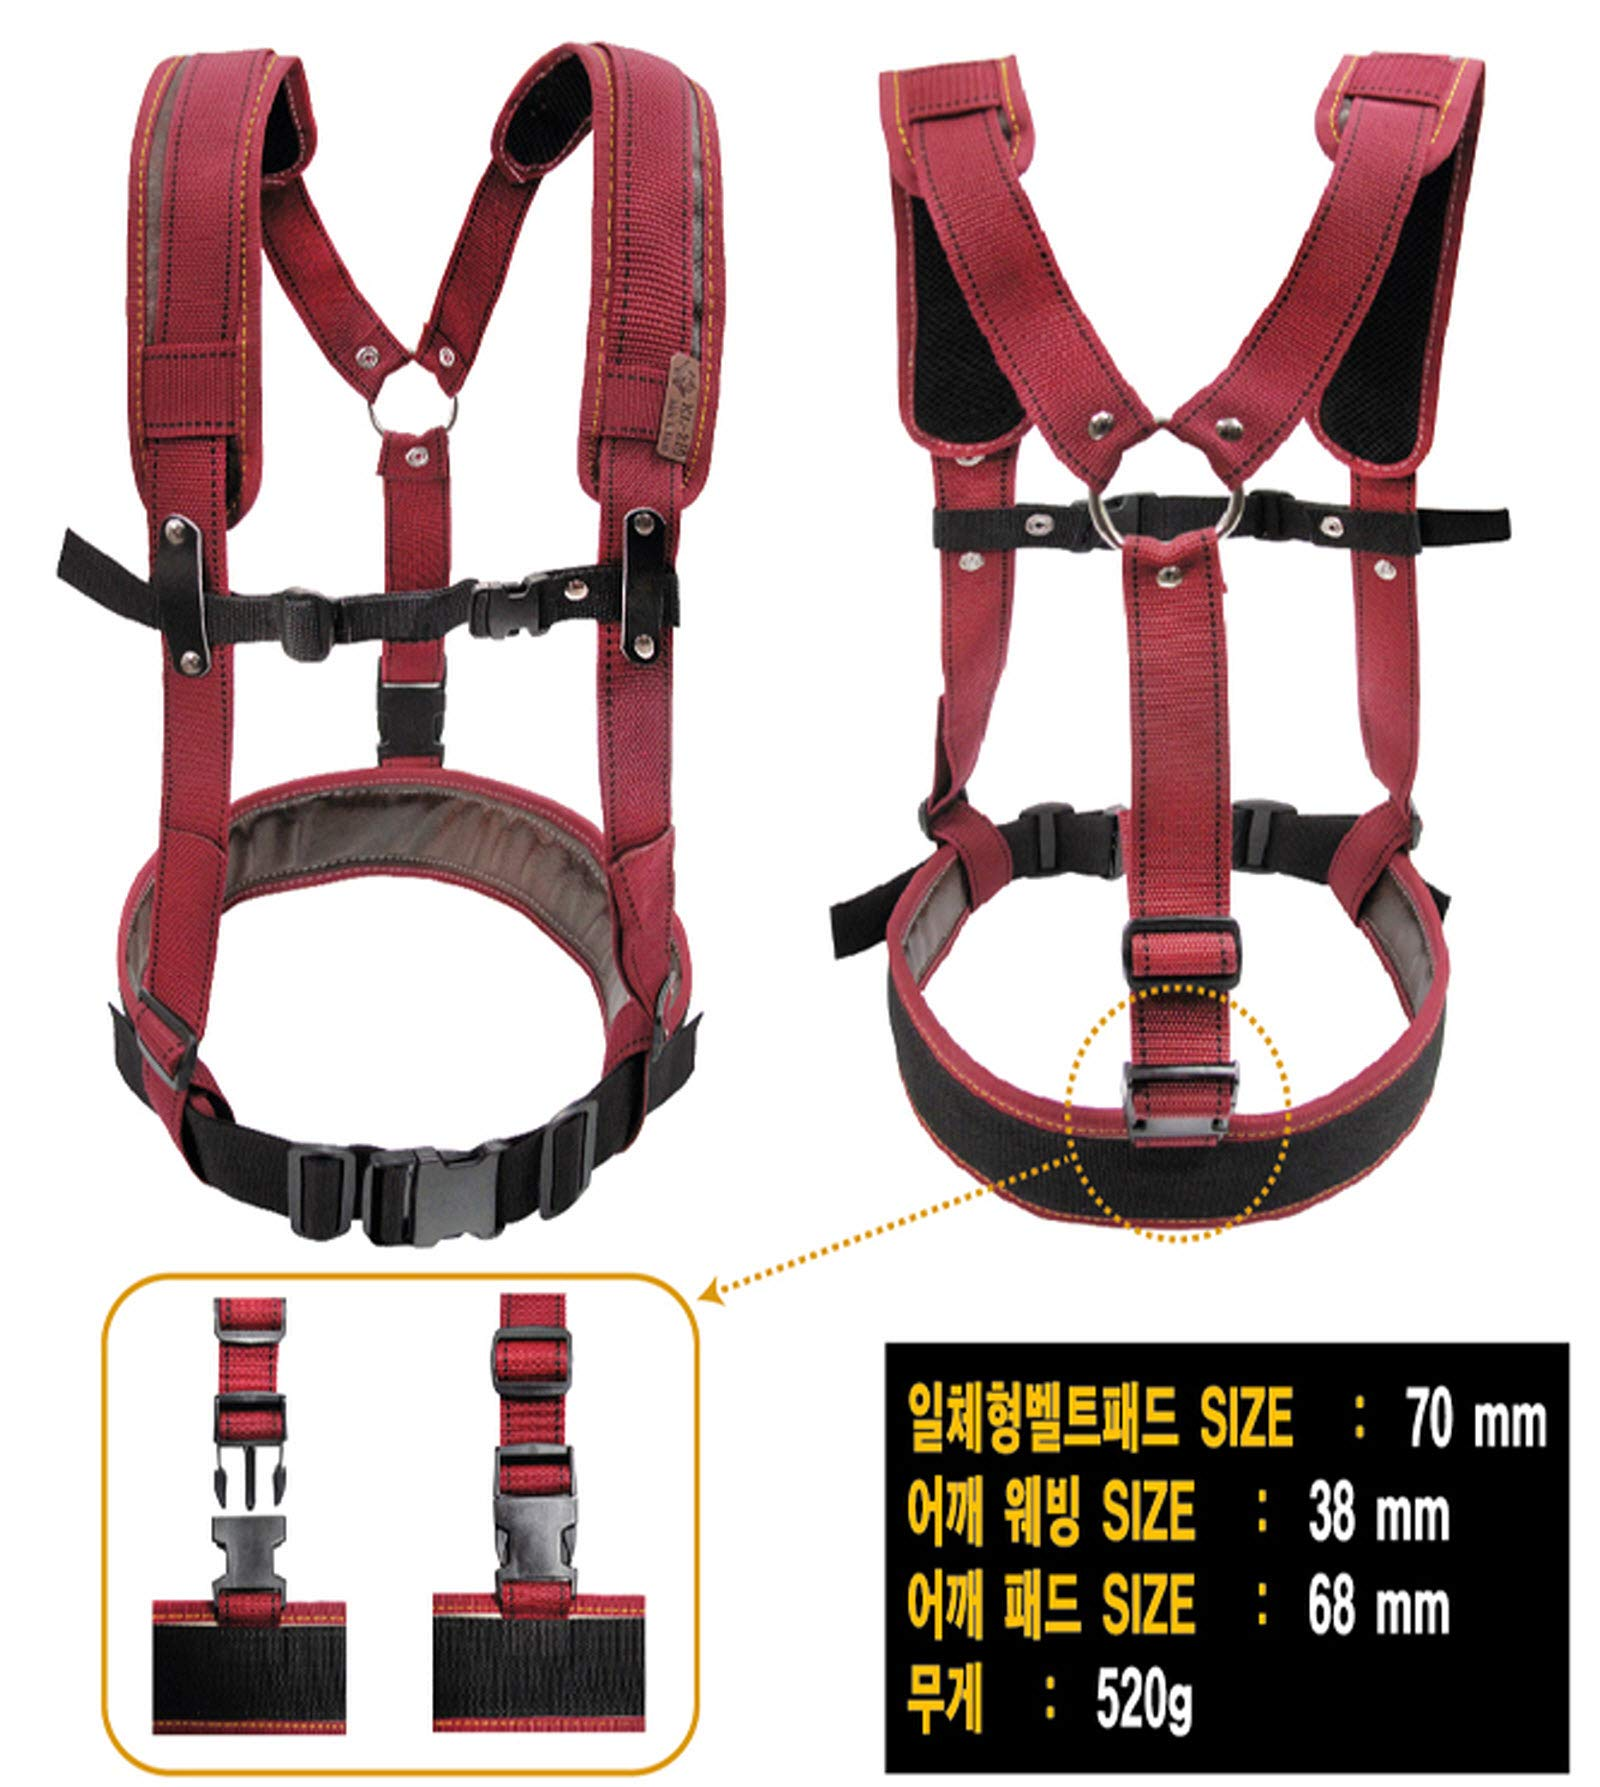 KAYA KL- 210 Carpenter Work Tool Belt Suspenders Support Adjustable Length by KAYA (Image #3)